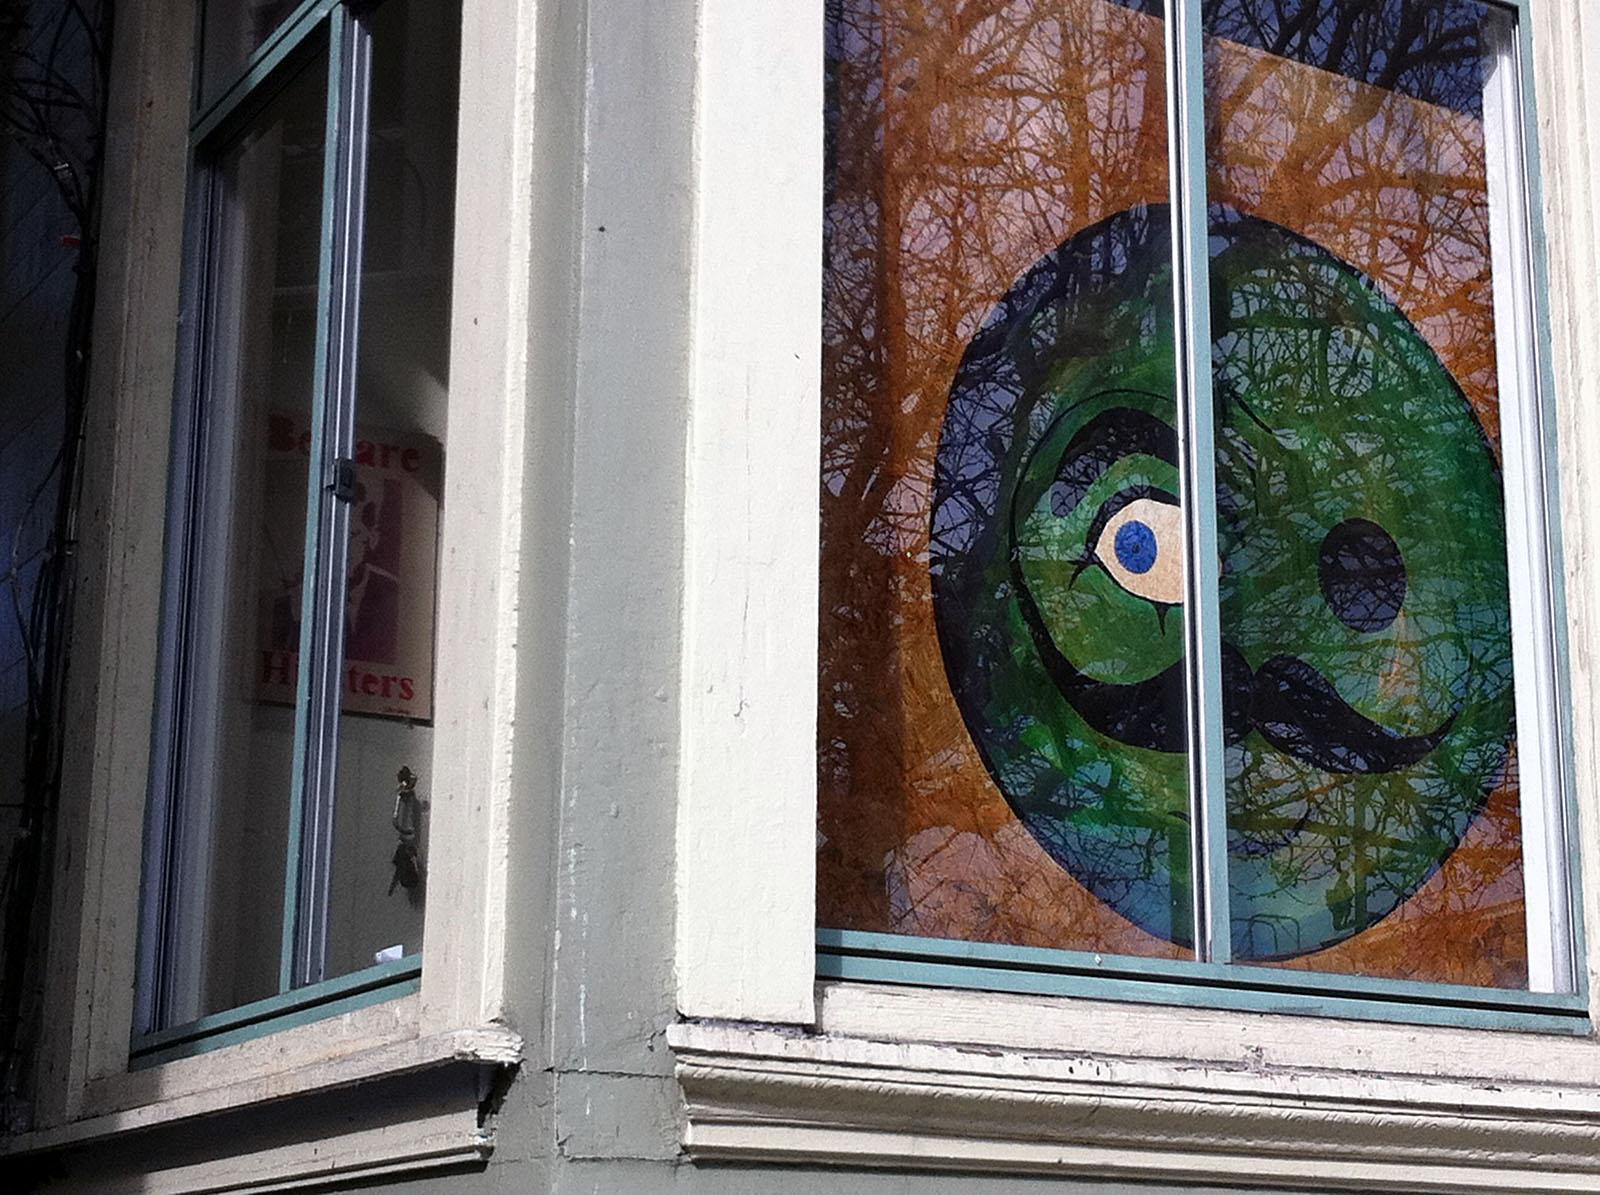 Visual Oxymoron on 24th Street?